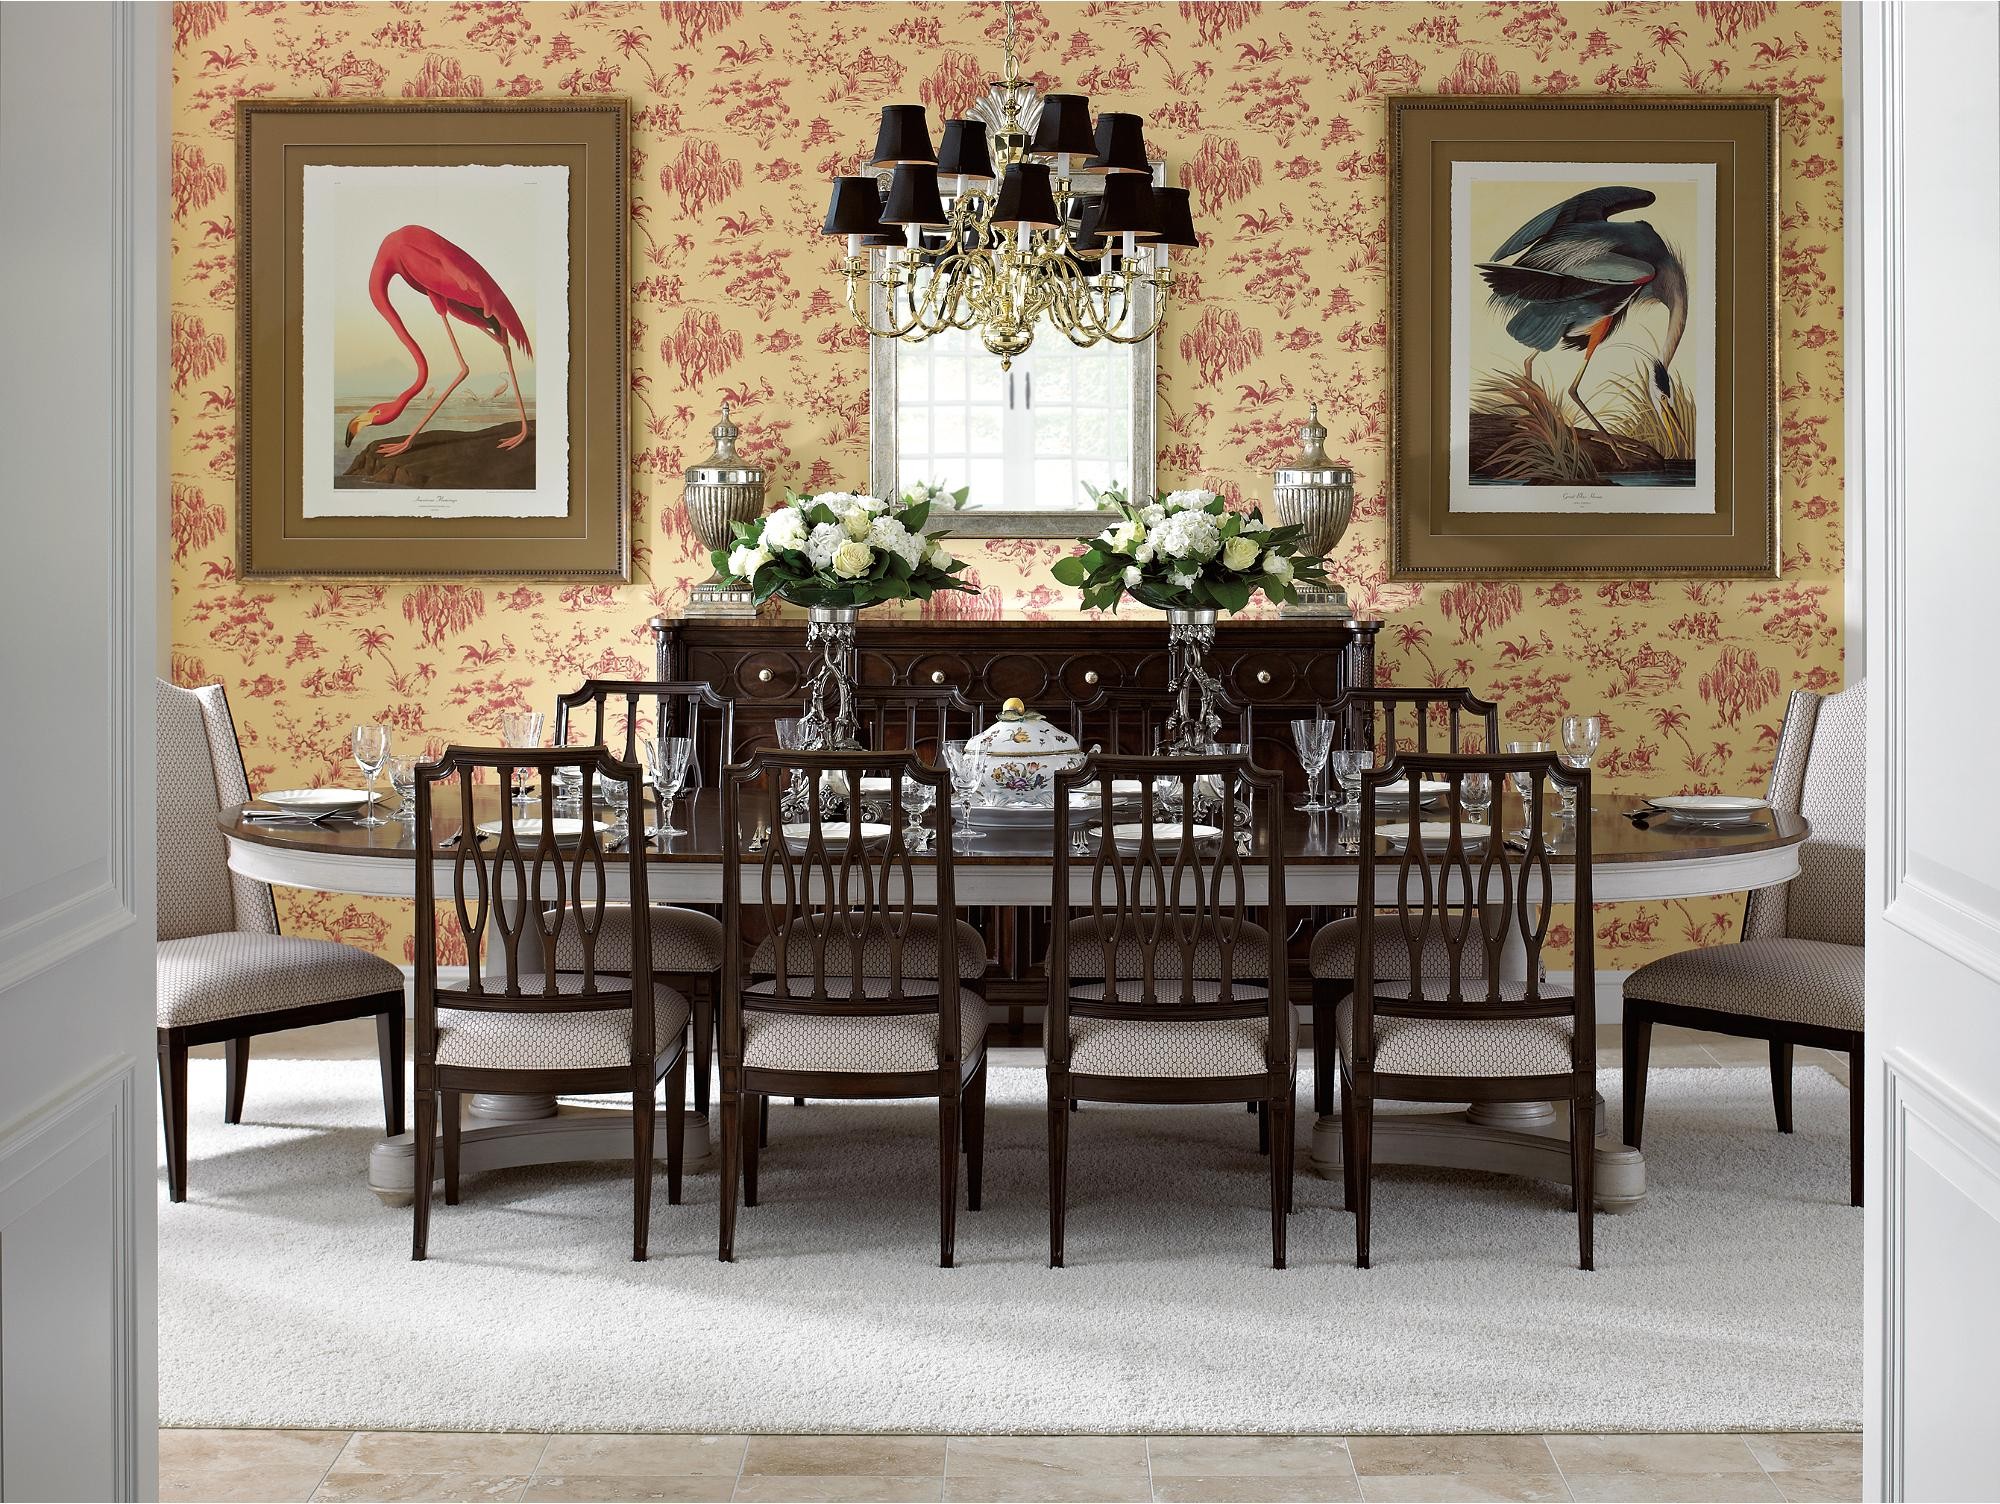 Stanley Furniture Charleston Regency Formal Dining Room Group - Item Number: 302-1 Dining Room Group 1